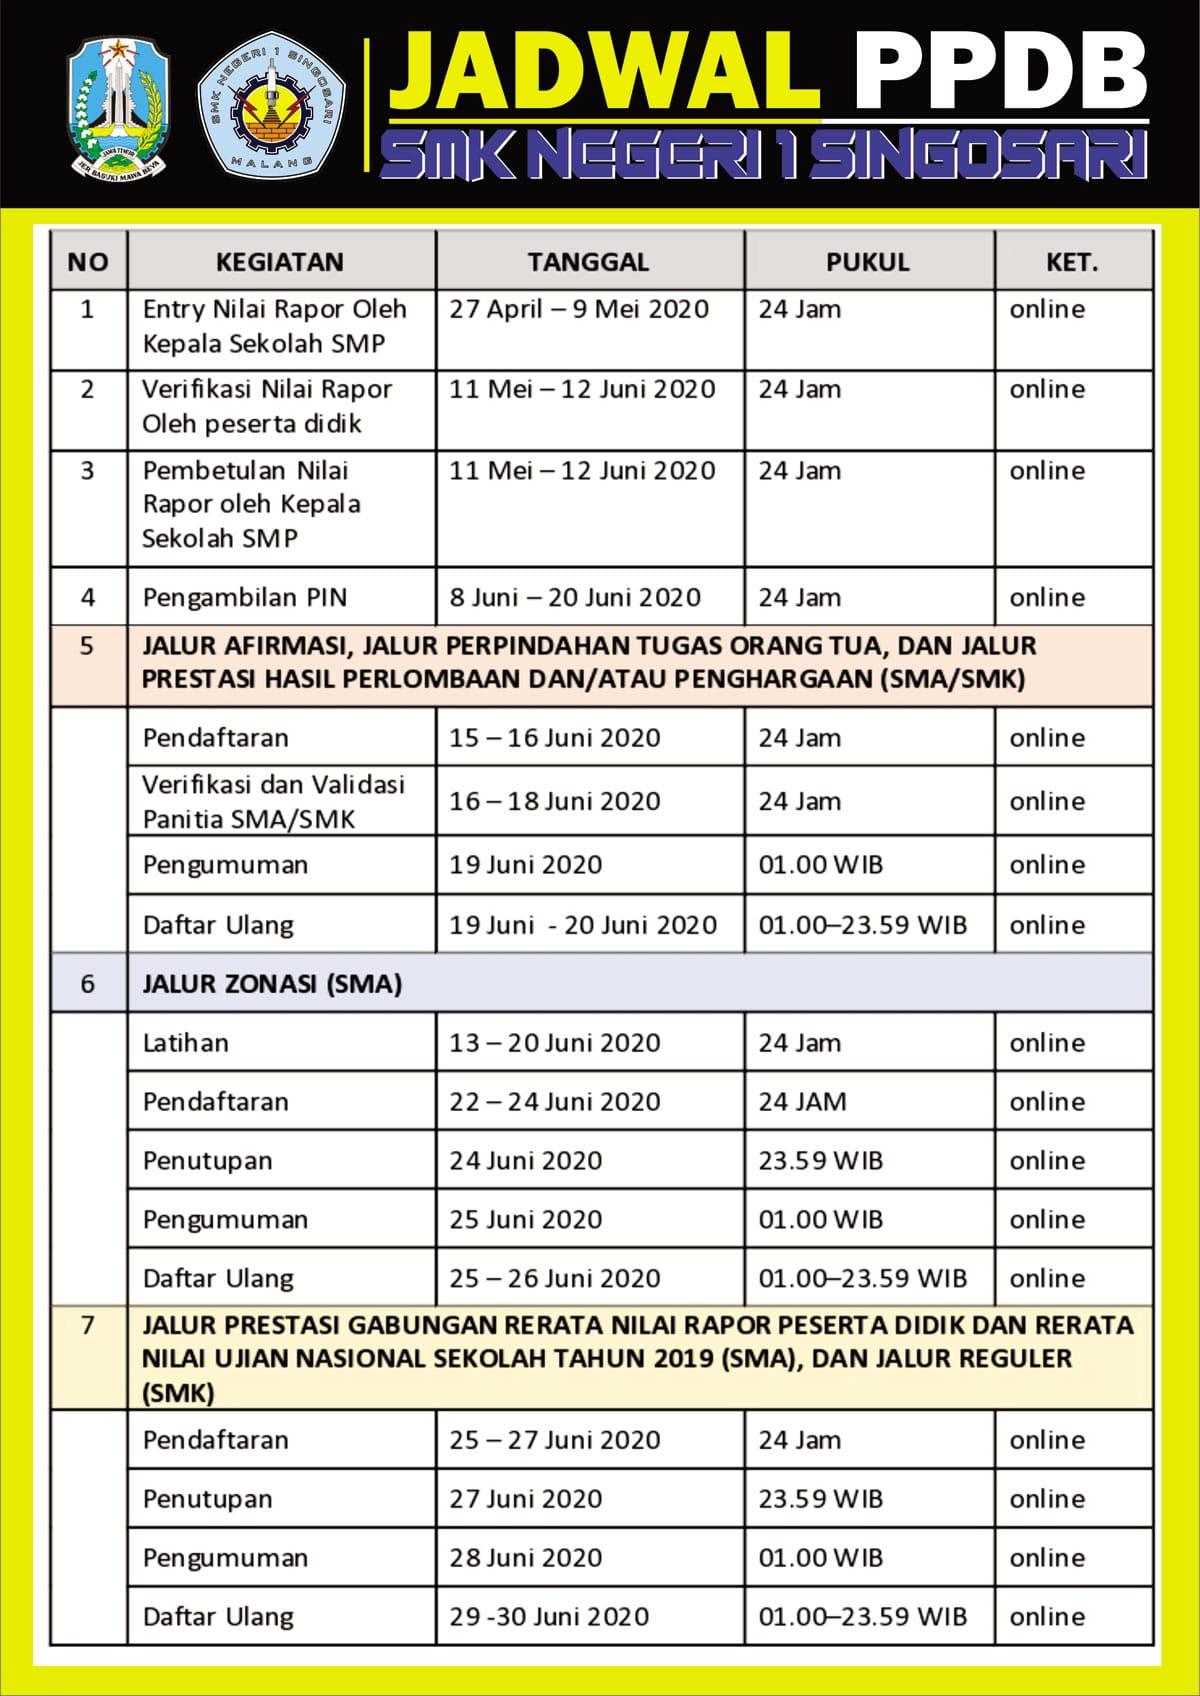 PPDB SMKN 1 Singosari 2020 Jadwal